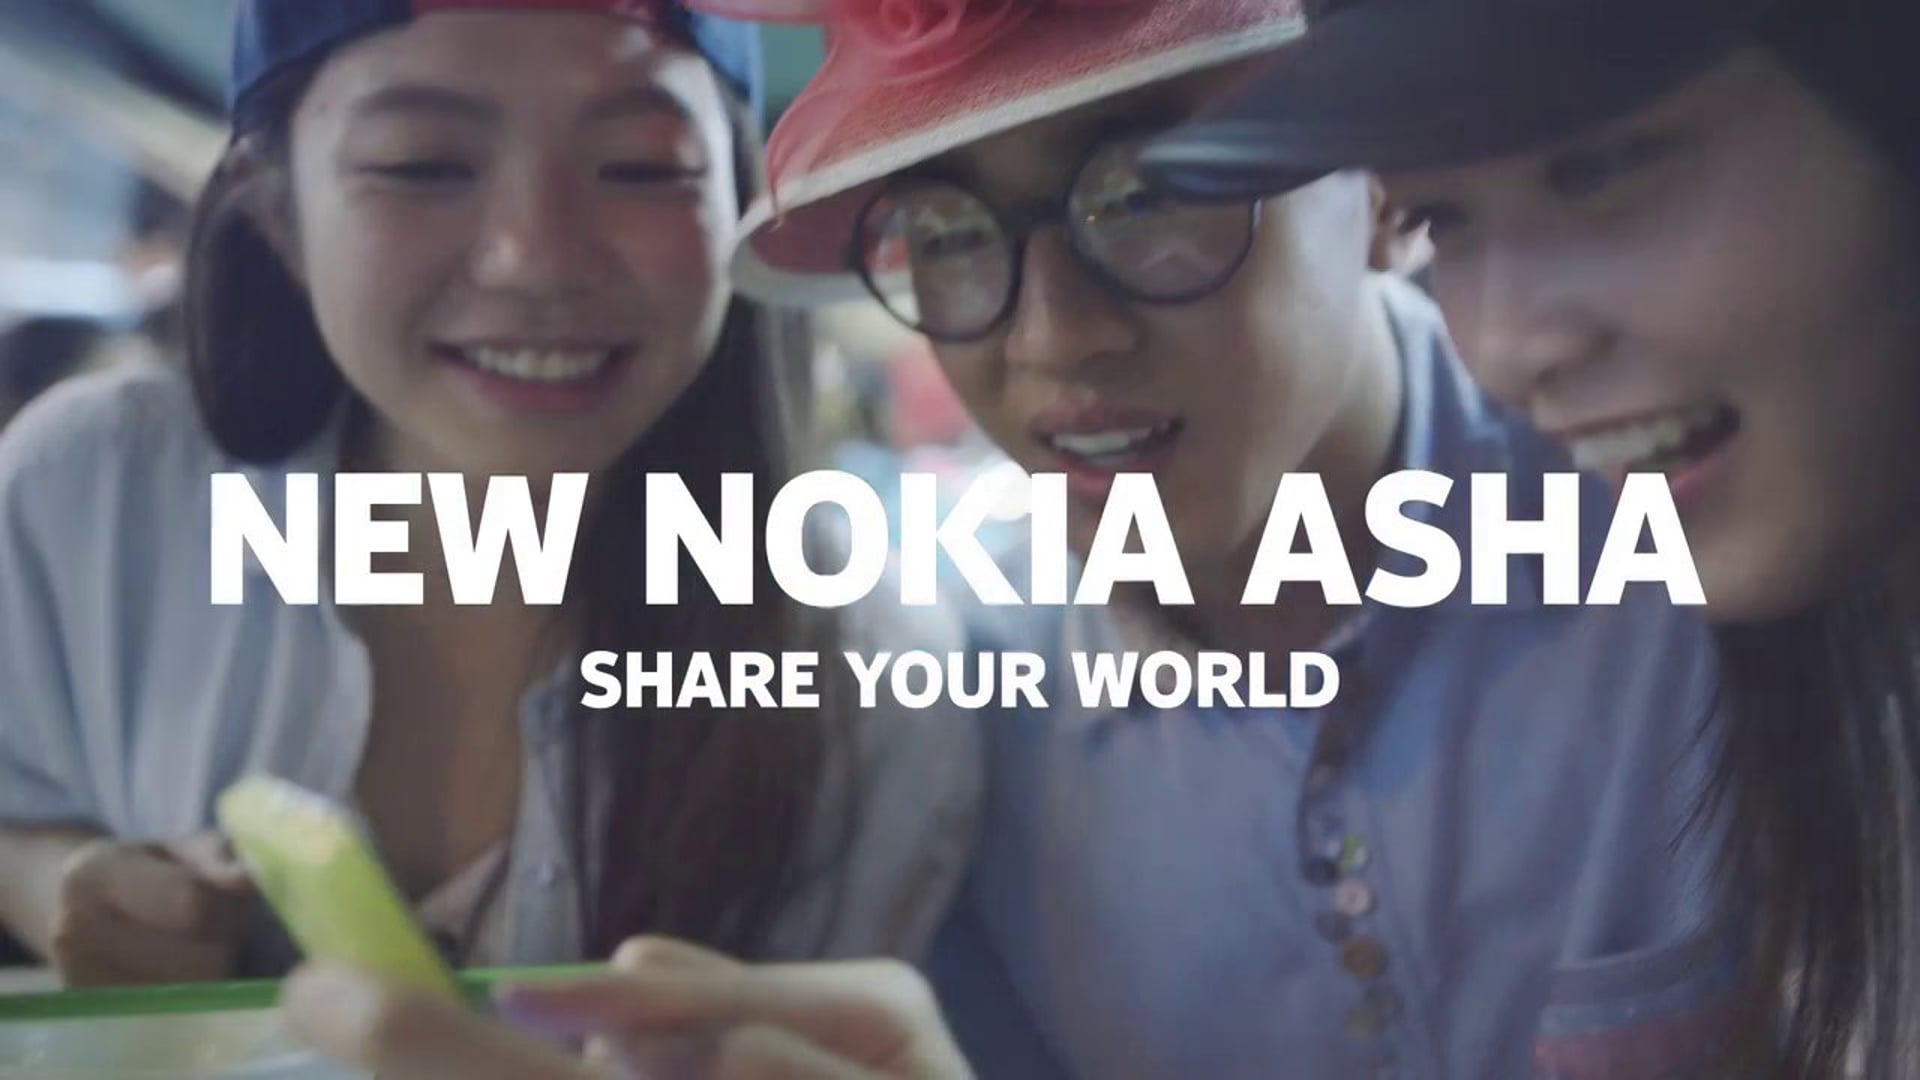 New Nokia Asha range - share your world